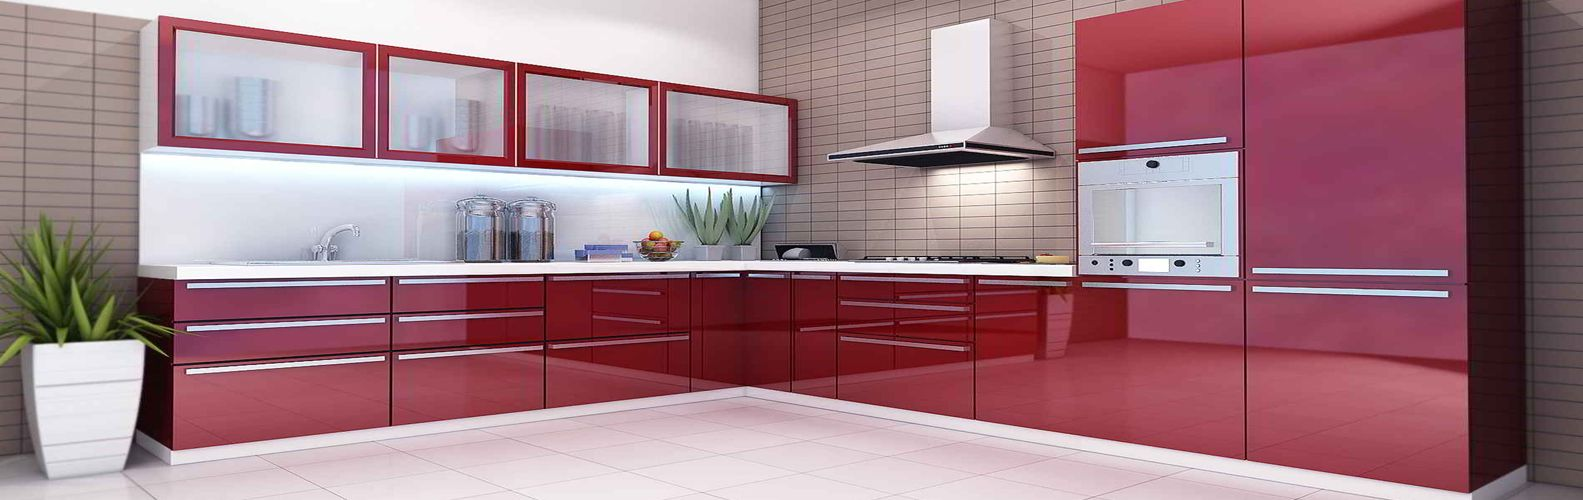 Heavens Interior Designers Kottayam Interiors Design For Home Endearing New Model Kitchen Design Design Decoration